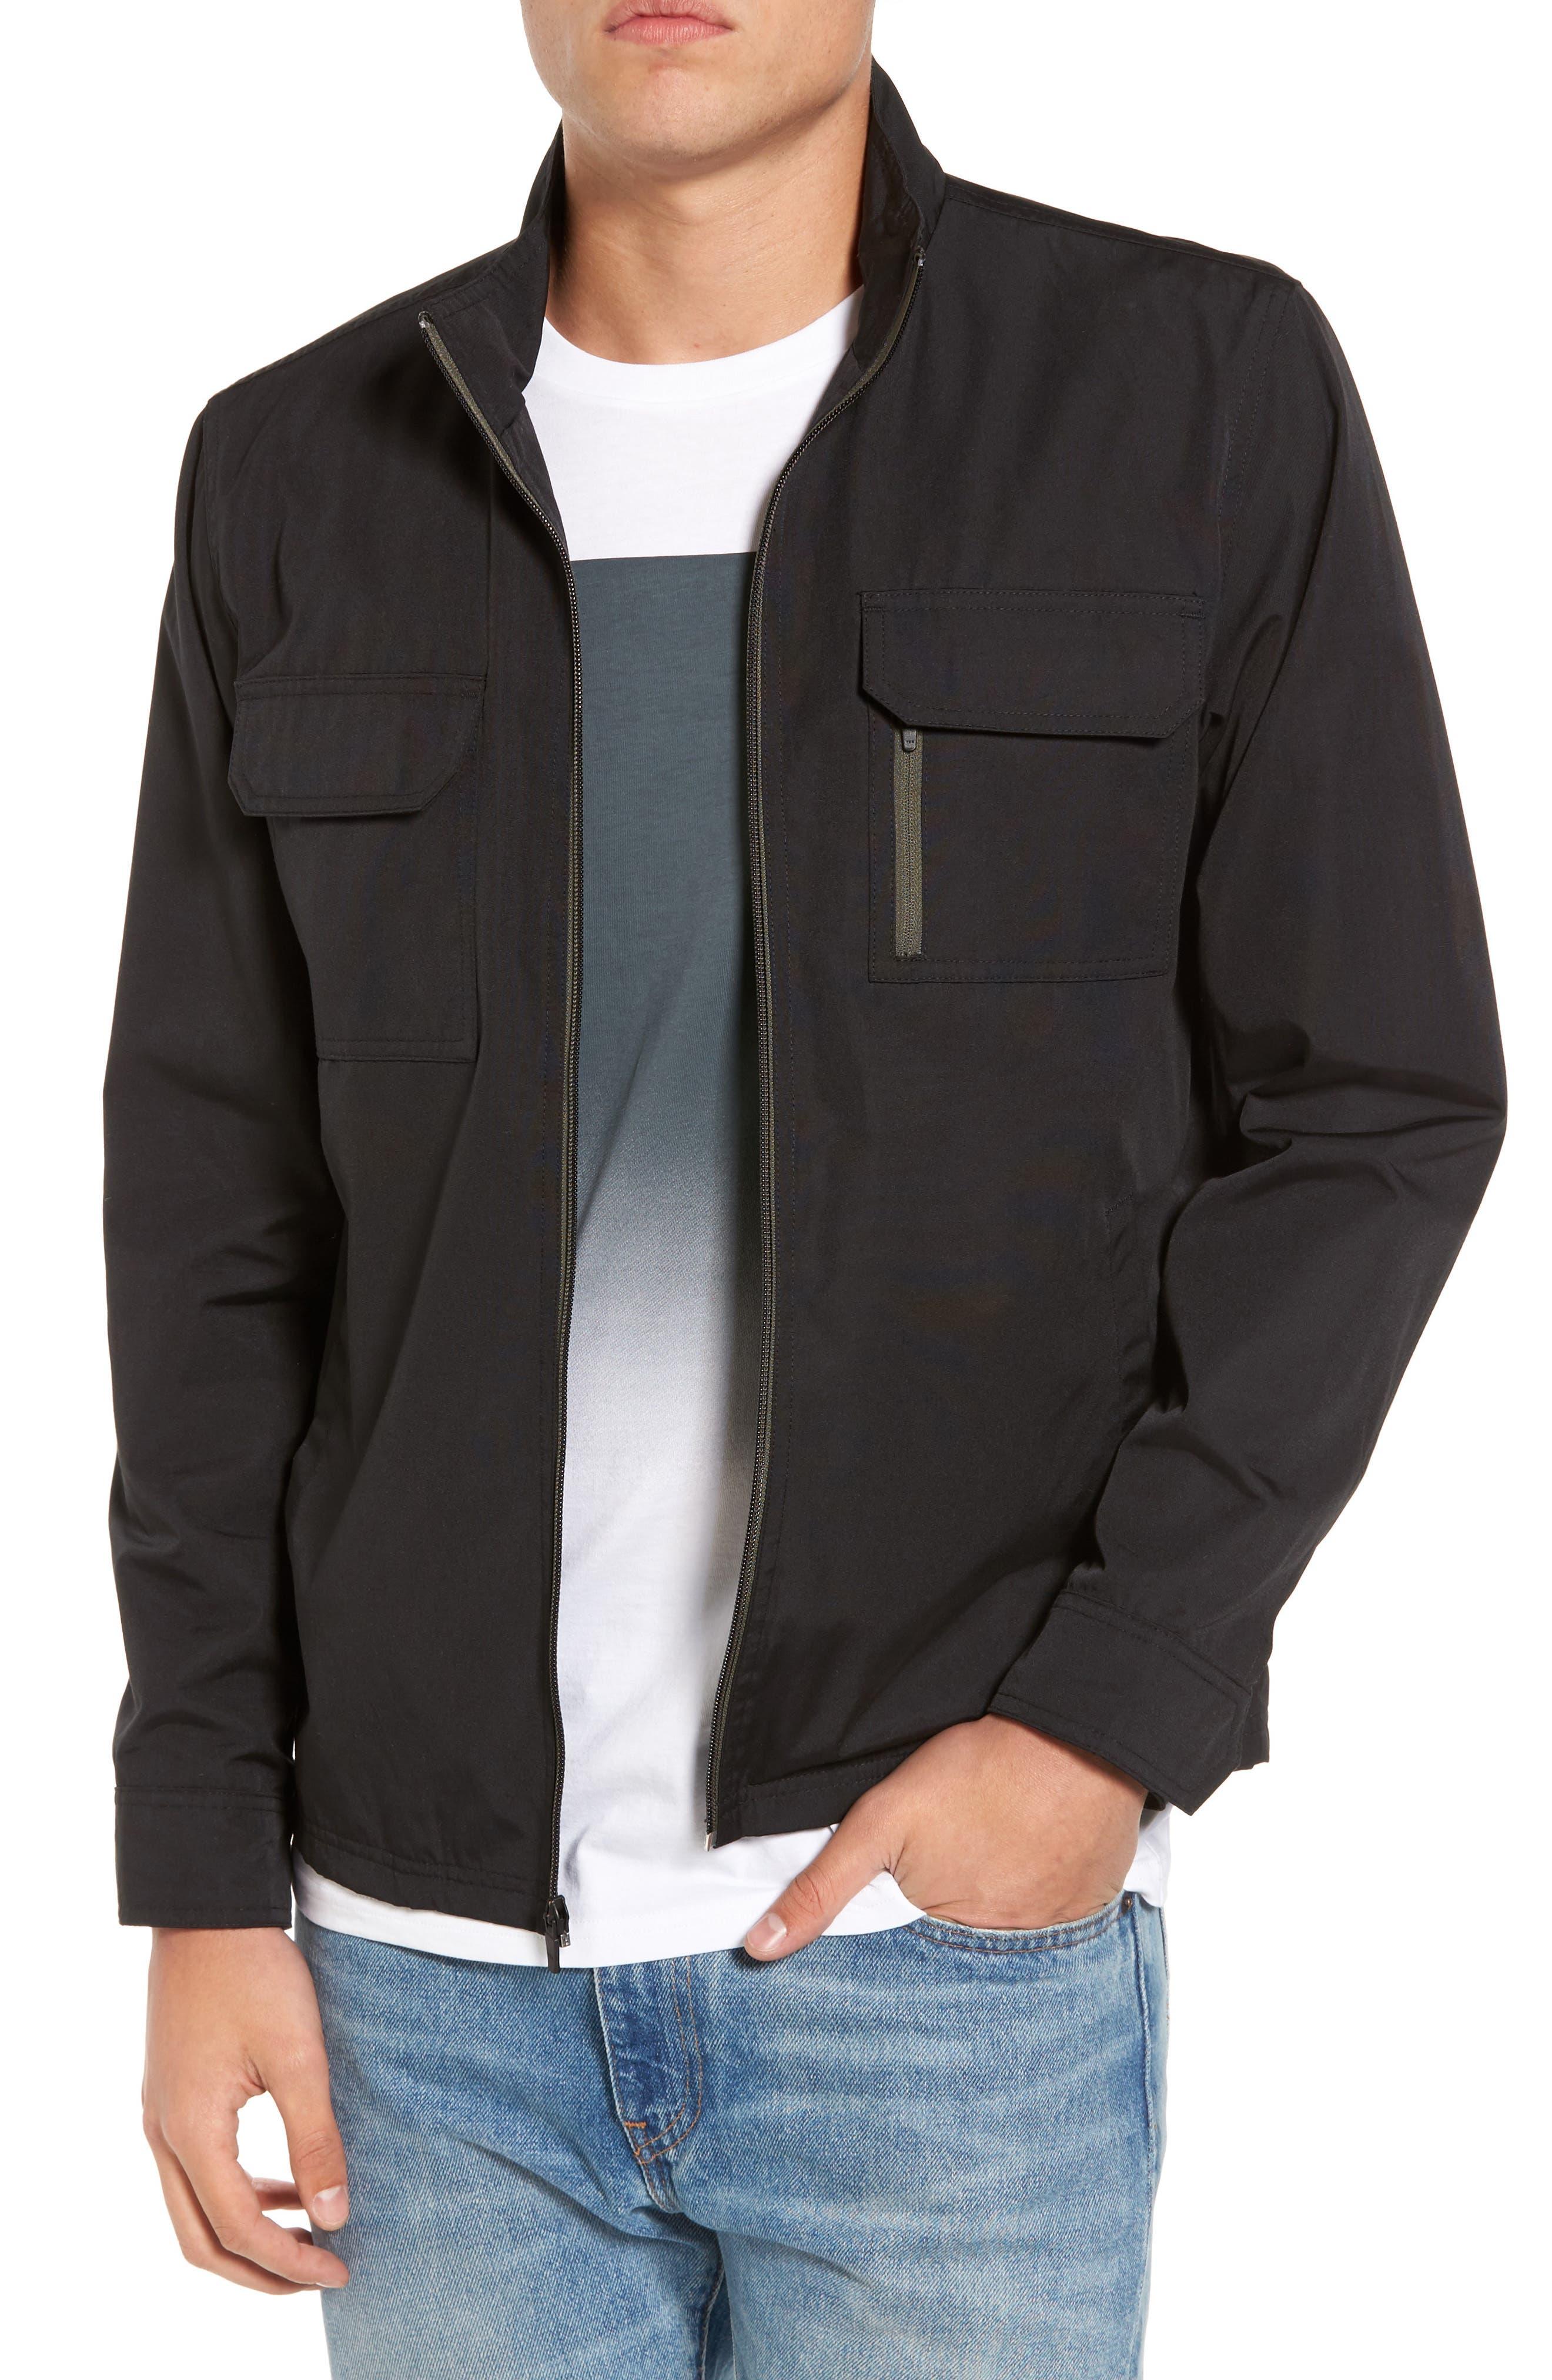 Staple Jacket,                             Main thumbnail 1, color,                             002